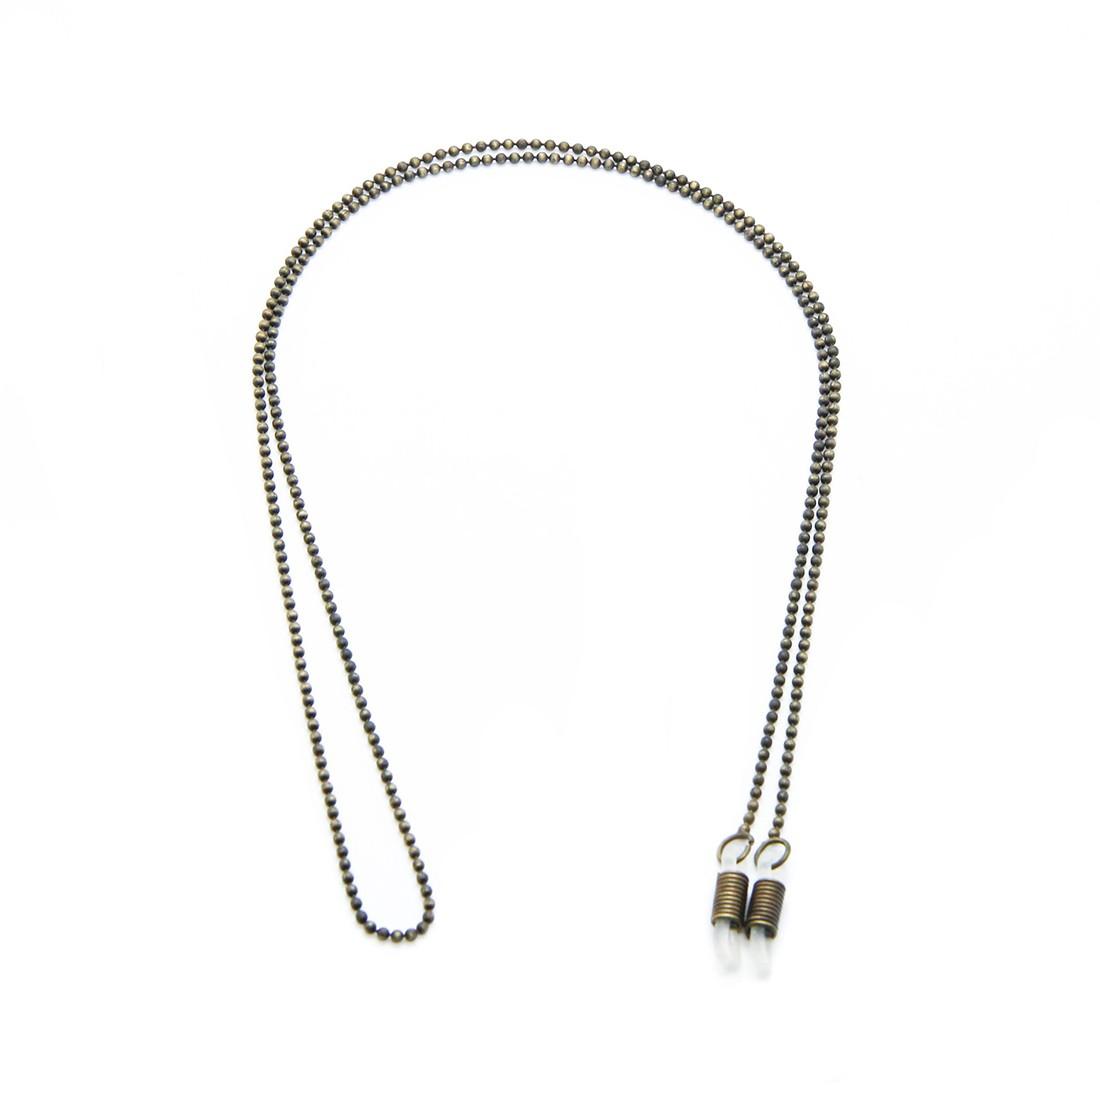 Corrente Metal B 1800 62cm Cor Ouro